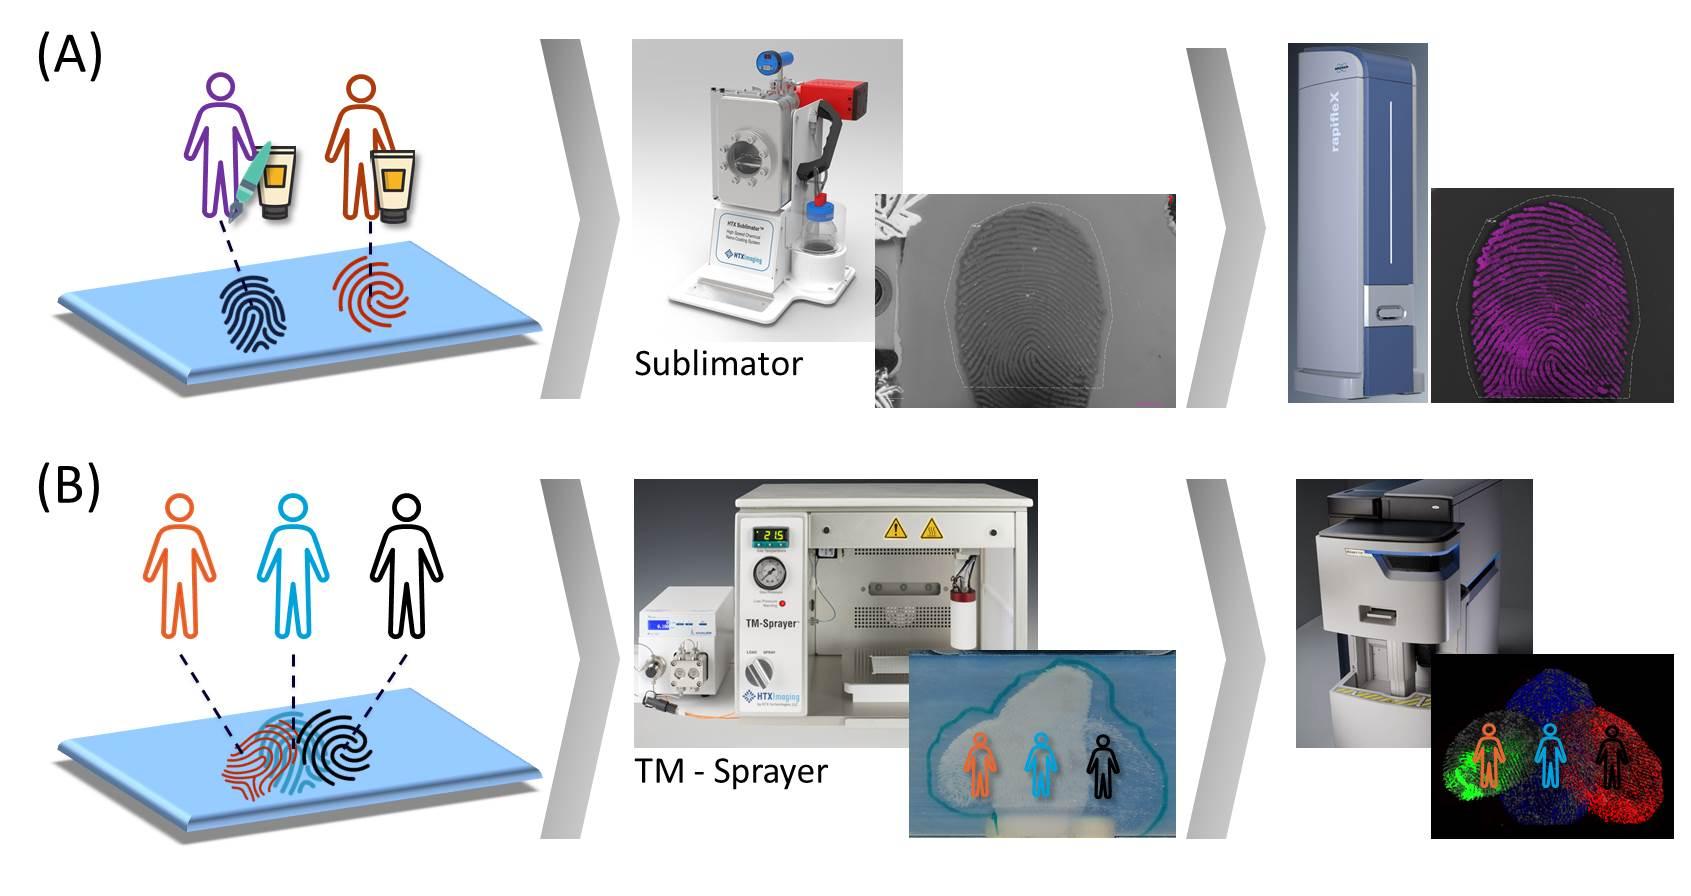 Figure 1.  Two workflows for fingerprint imaging.